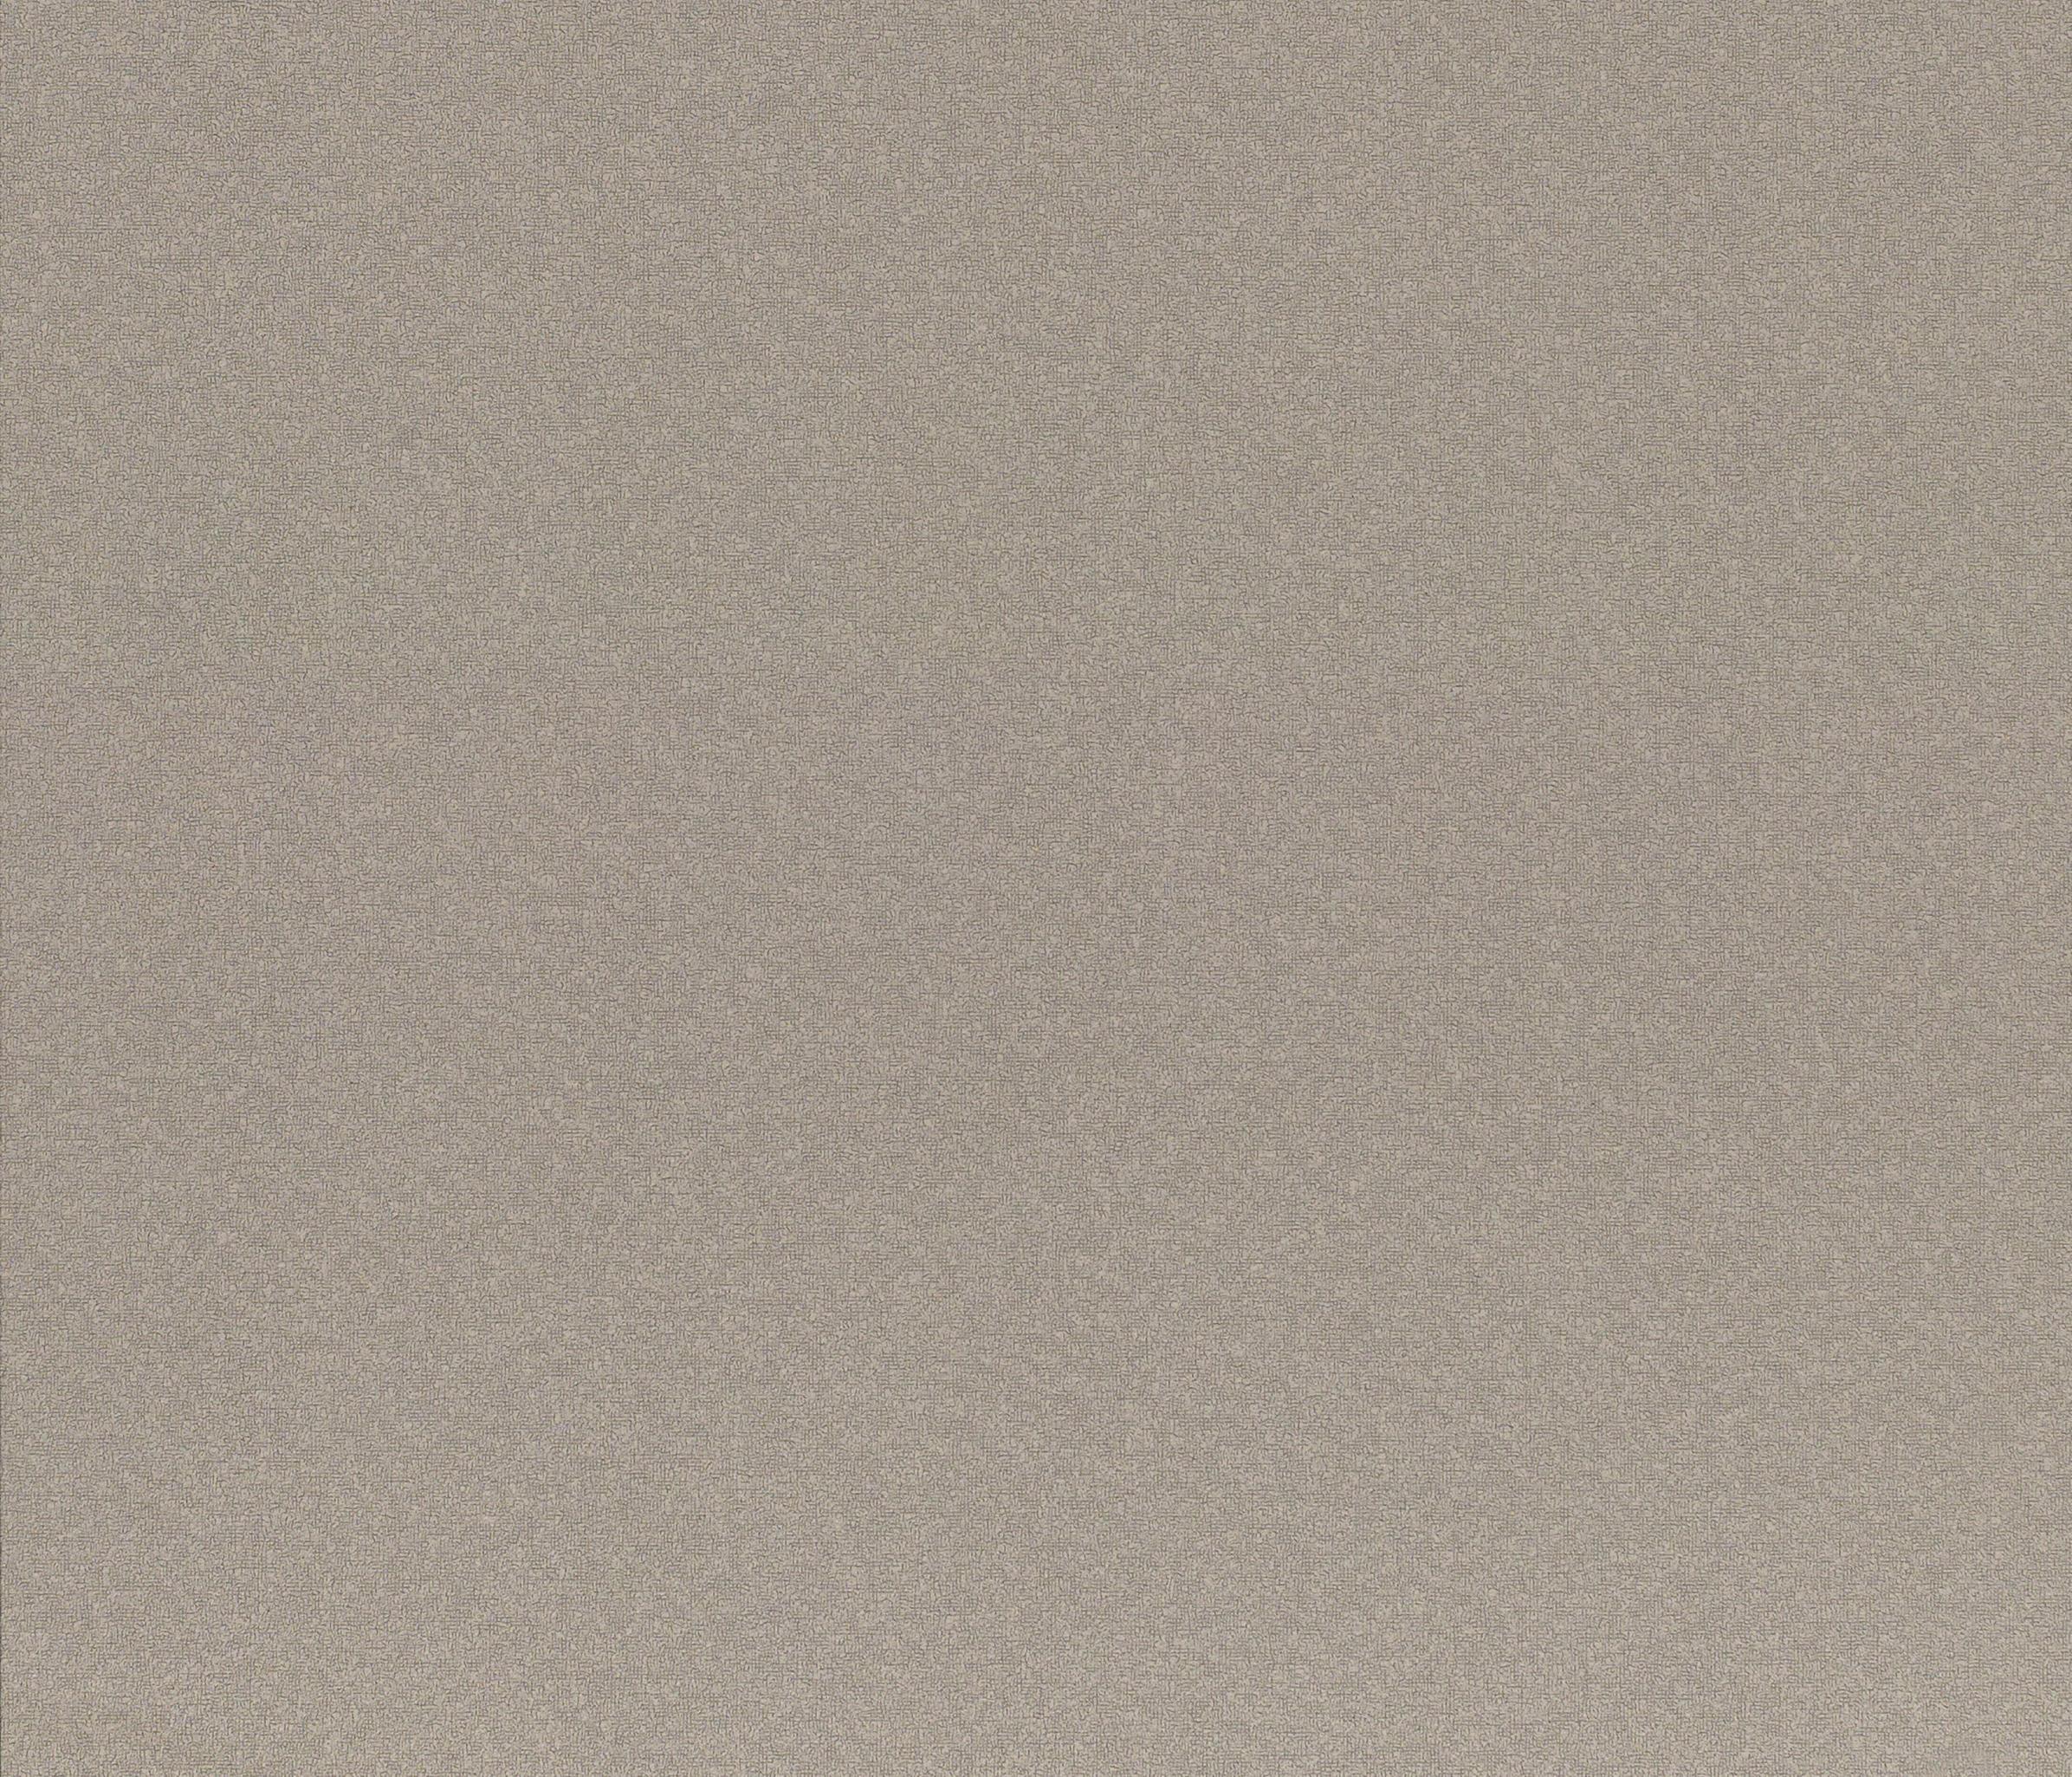 earth grigio 2 bodenfliesen von casalgrande padana. Black Bedroom Furniture Sets. Home Design Ideas